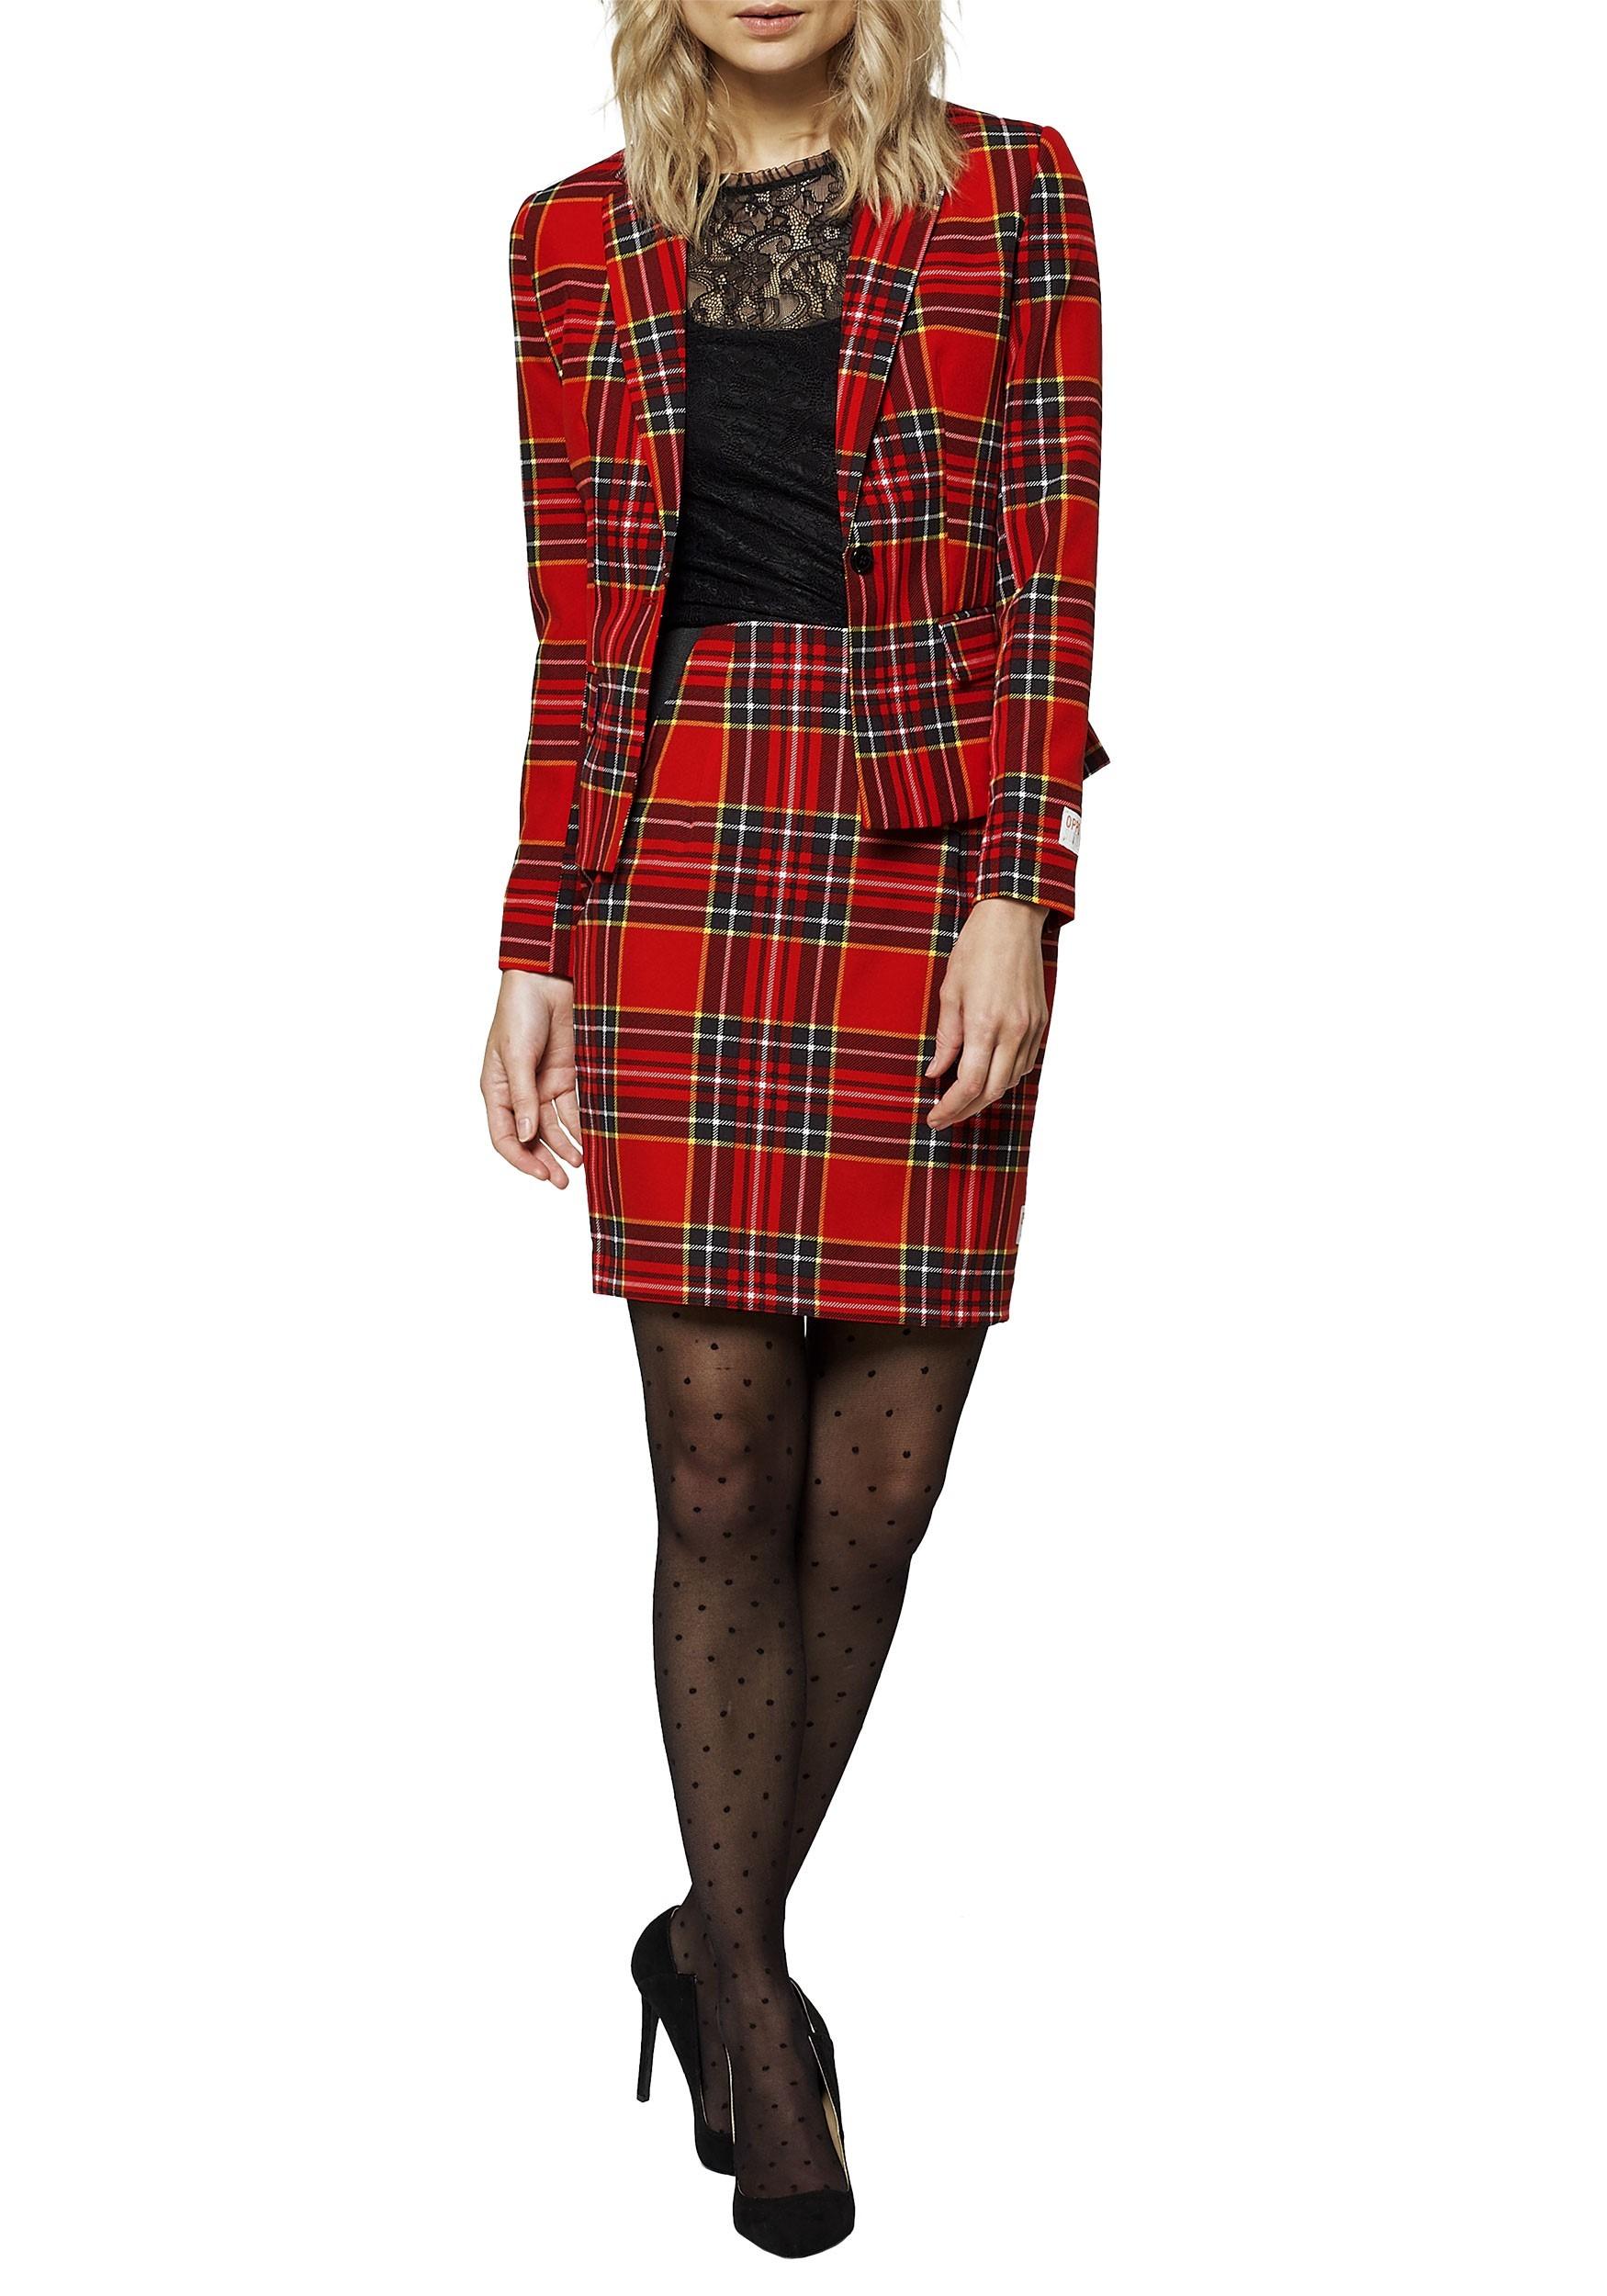 a8cd2de76f4730 Opposuit Lumber Jackie Women's Red Suit